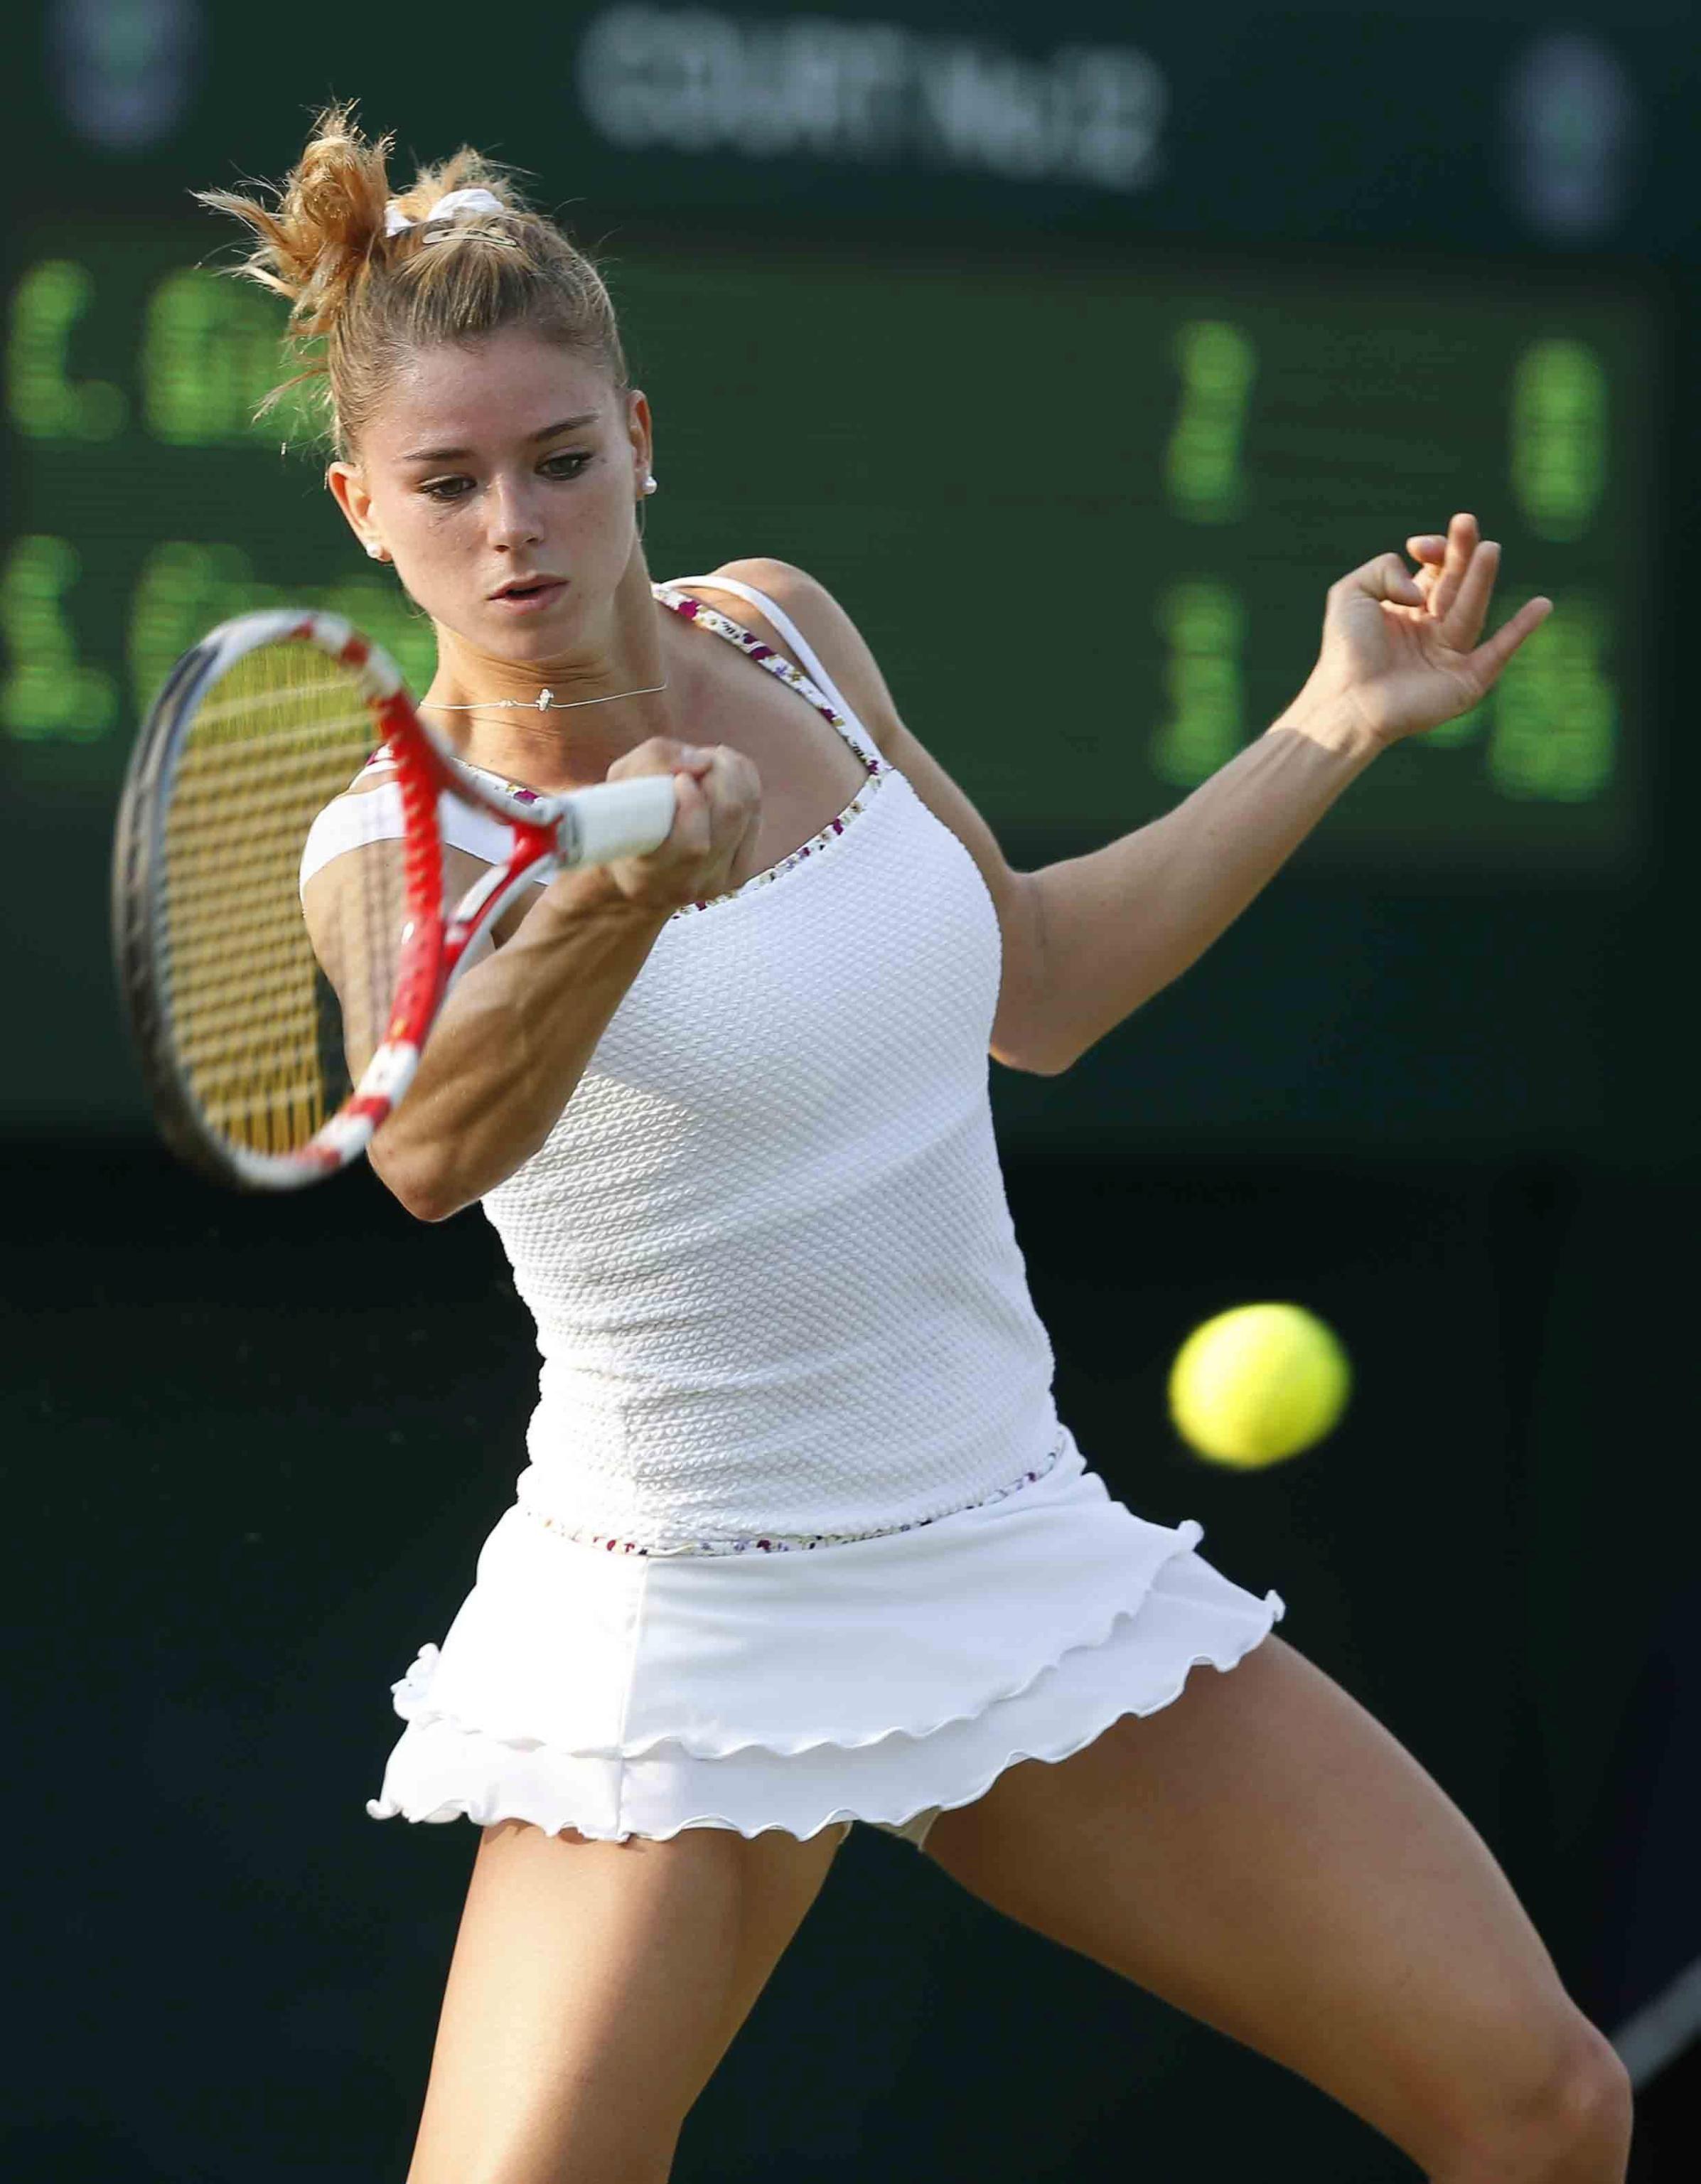 Camila Giorgi Wimbledon 2013. | CGiorgi | Sport tennis, Tennis, Tennis world